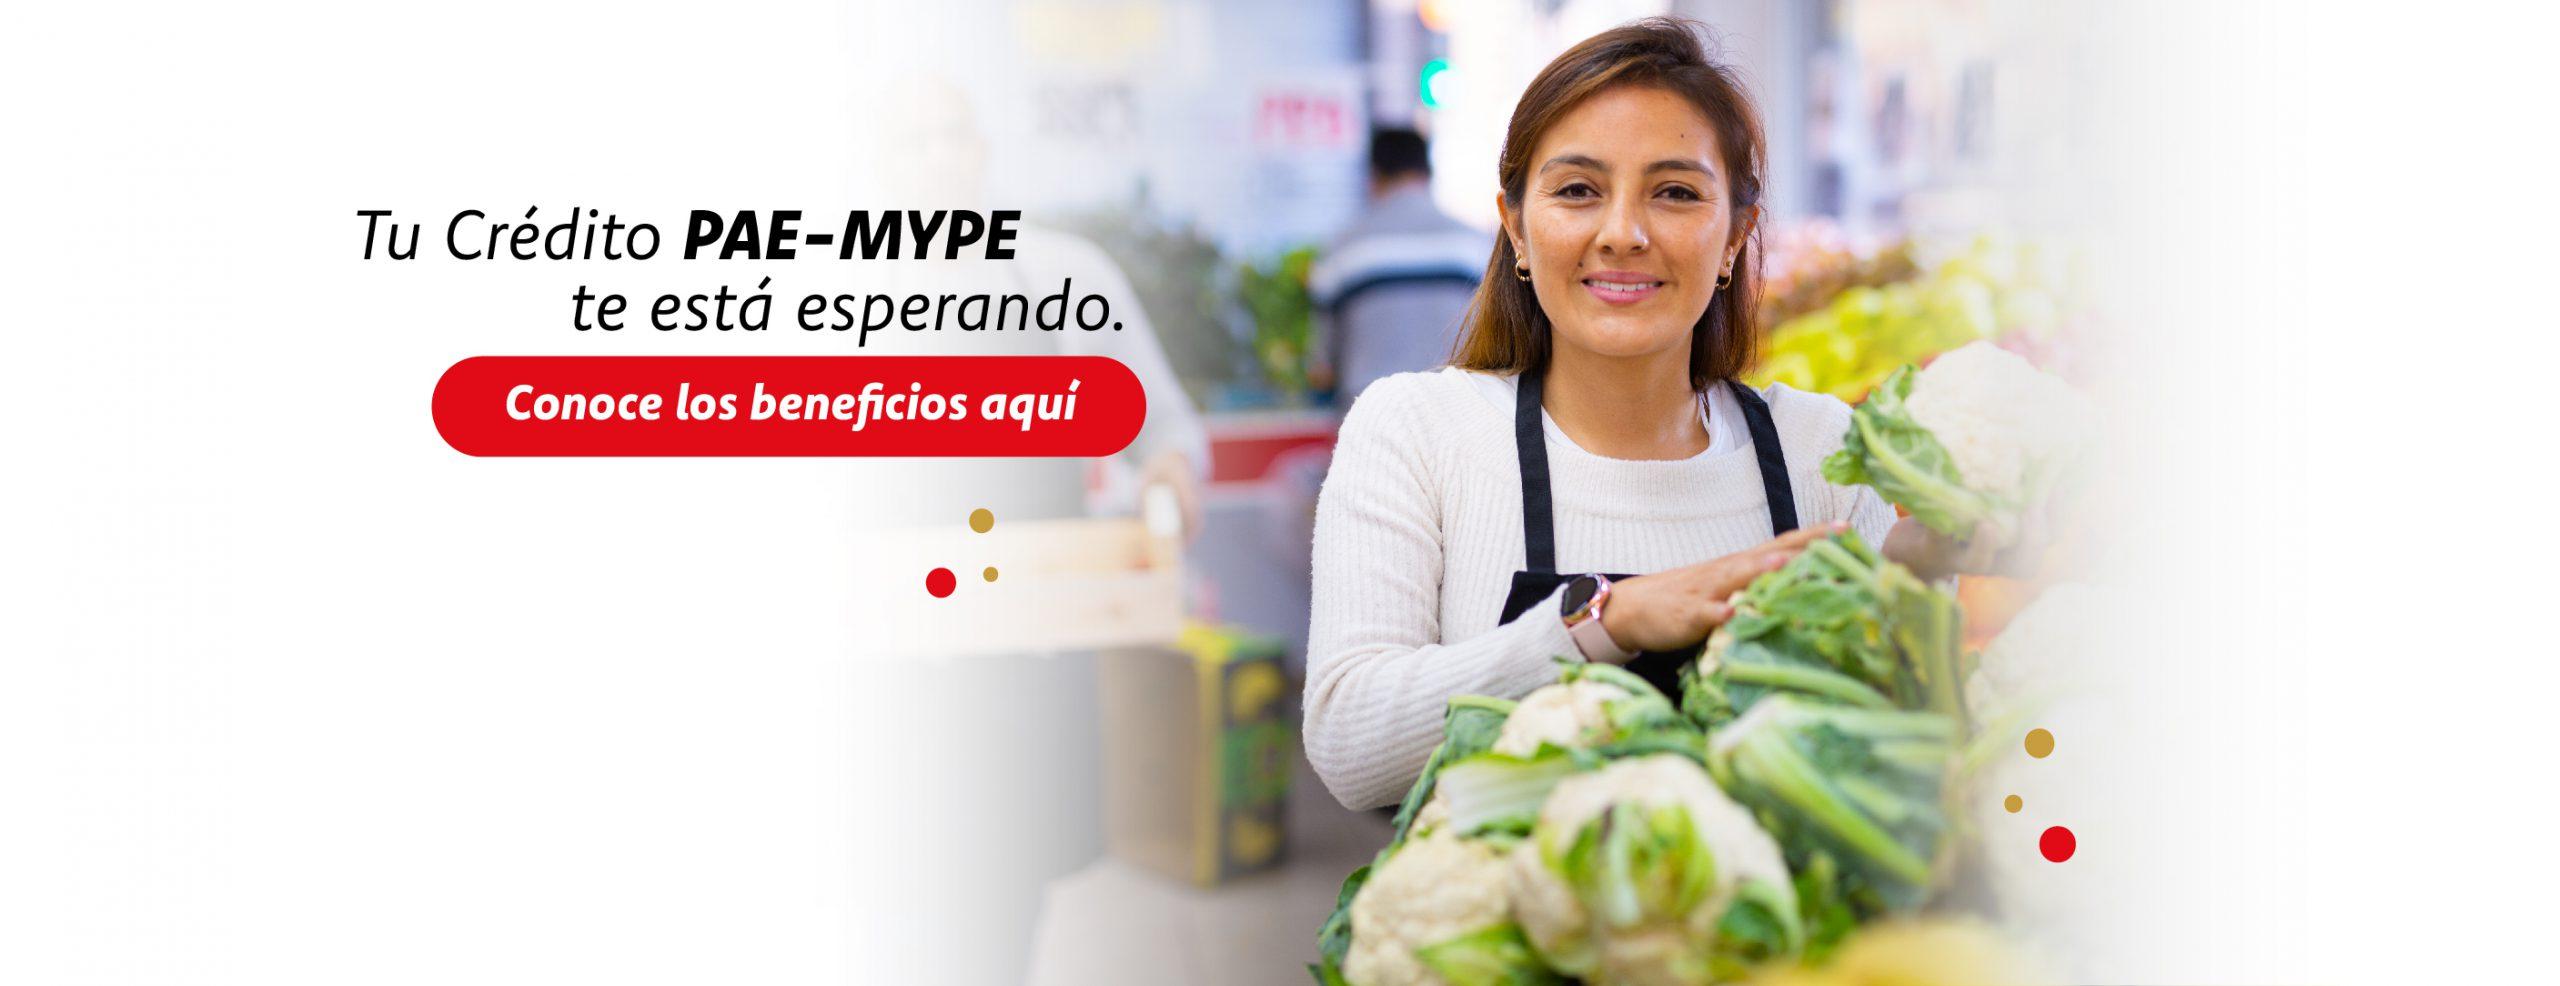 pae mype__1